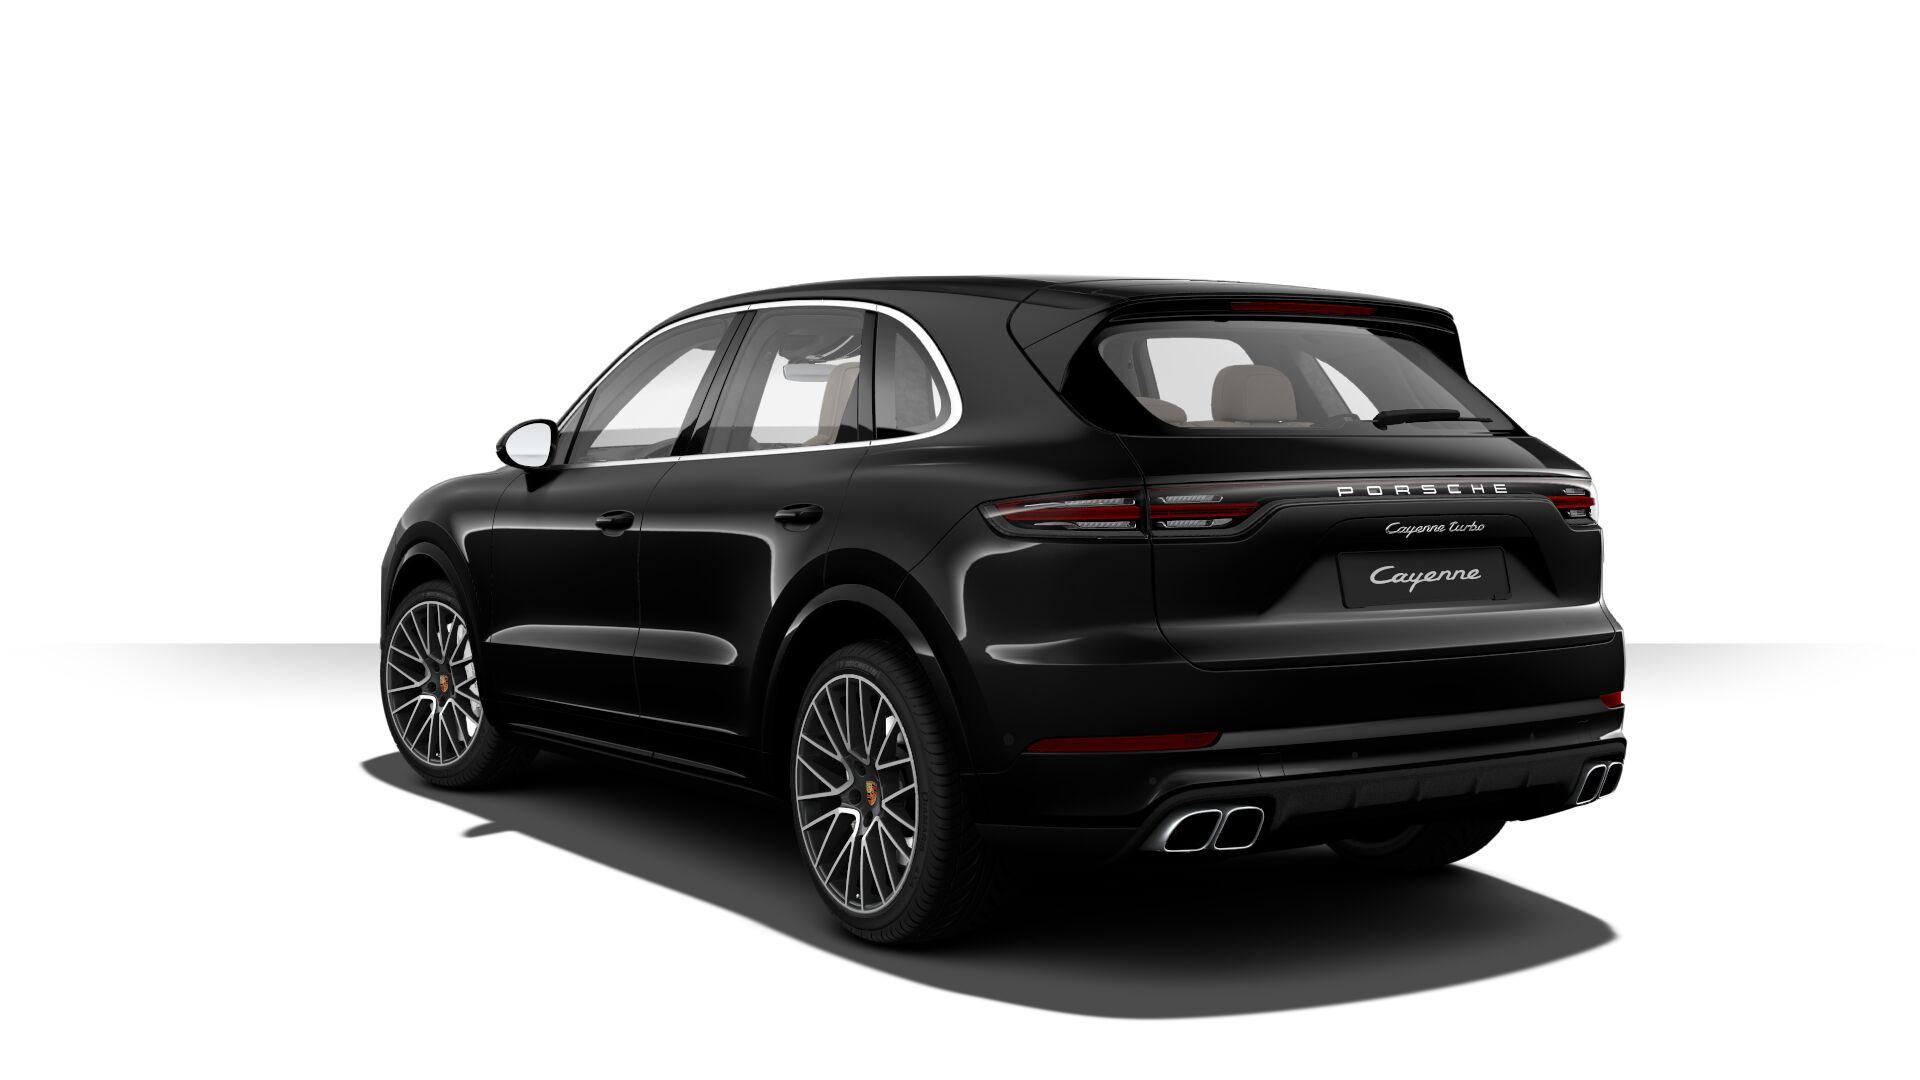 car aaa new rome luxury ferrari sport rent hire speciale rental